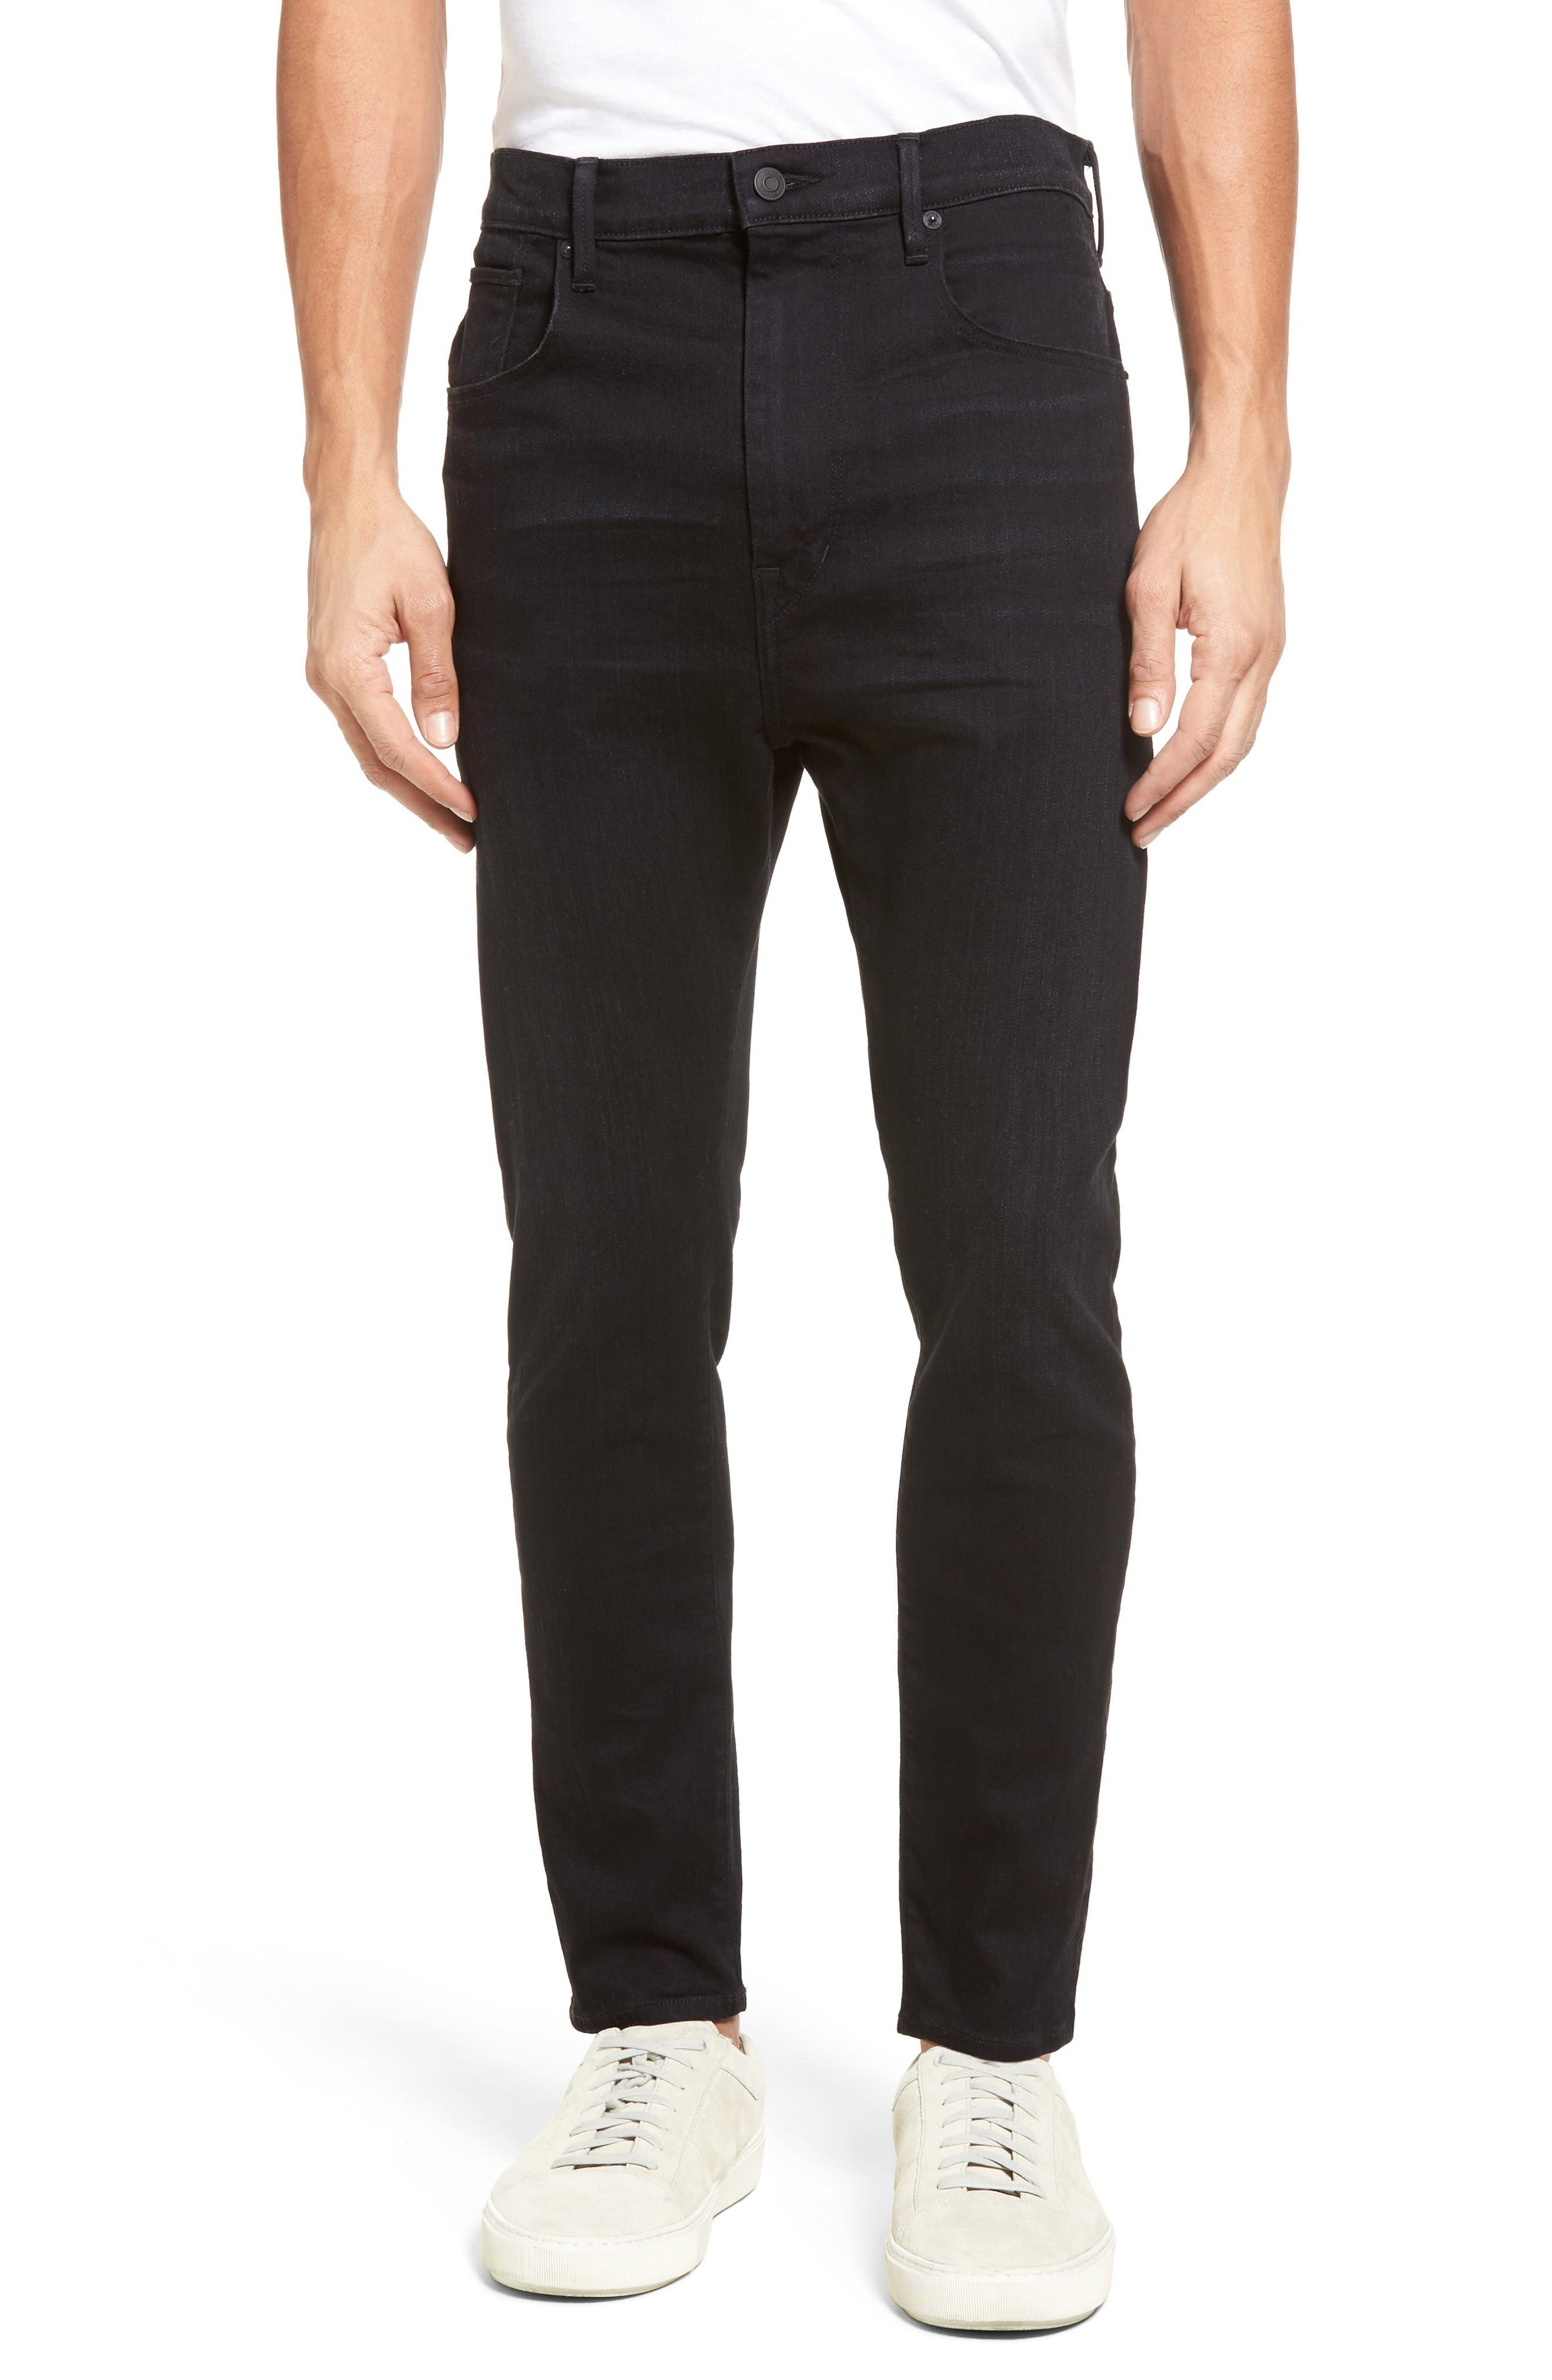 Vince Drop Crotch Skinny Slouchy Leg Jeans